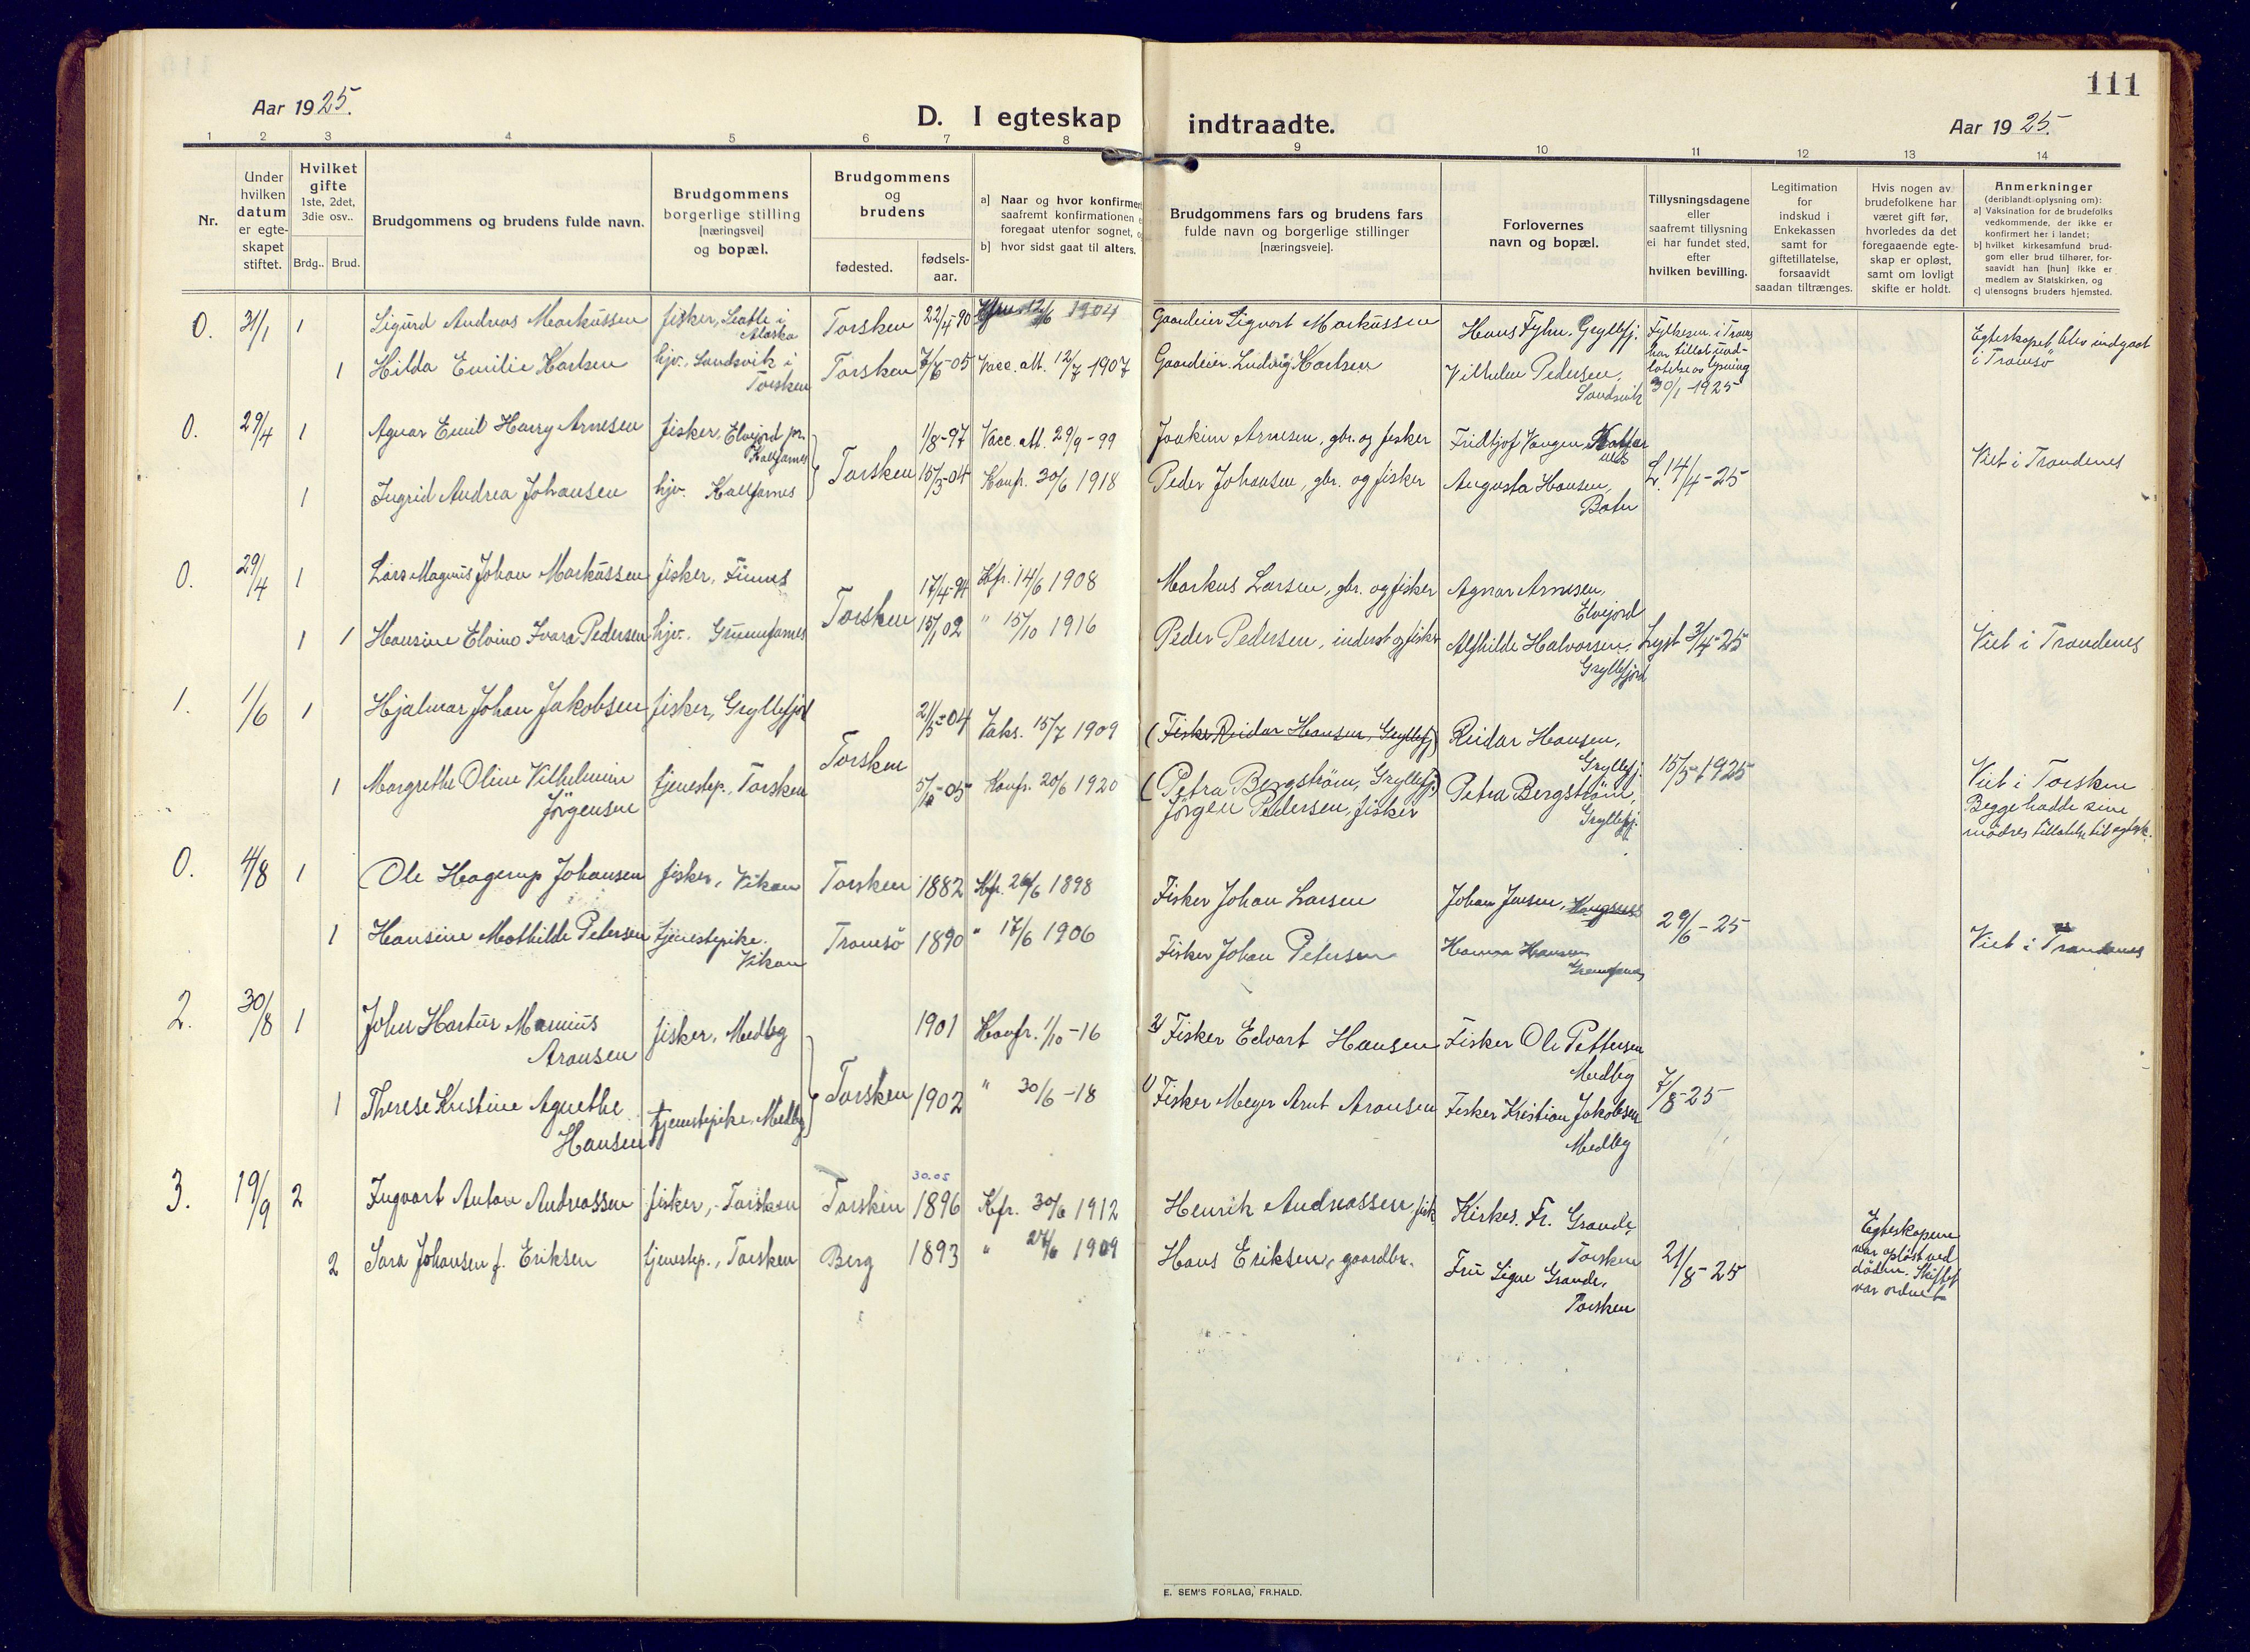 SATØ, Mefjord/Berg sokneprestkontor, G/Ga/Gaa: Ministerialbok nr. 10, 1916-1928, s. 111